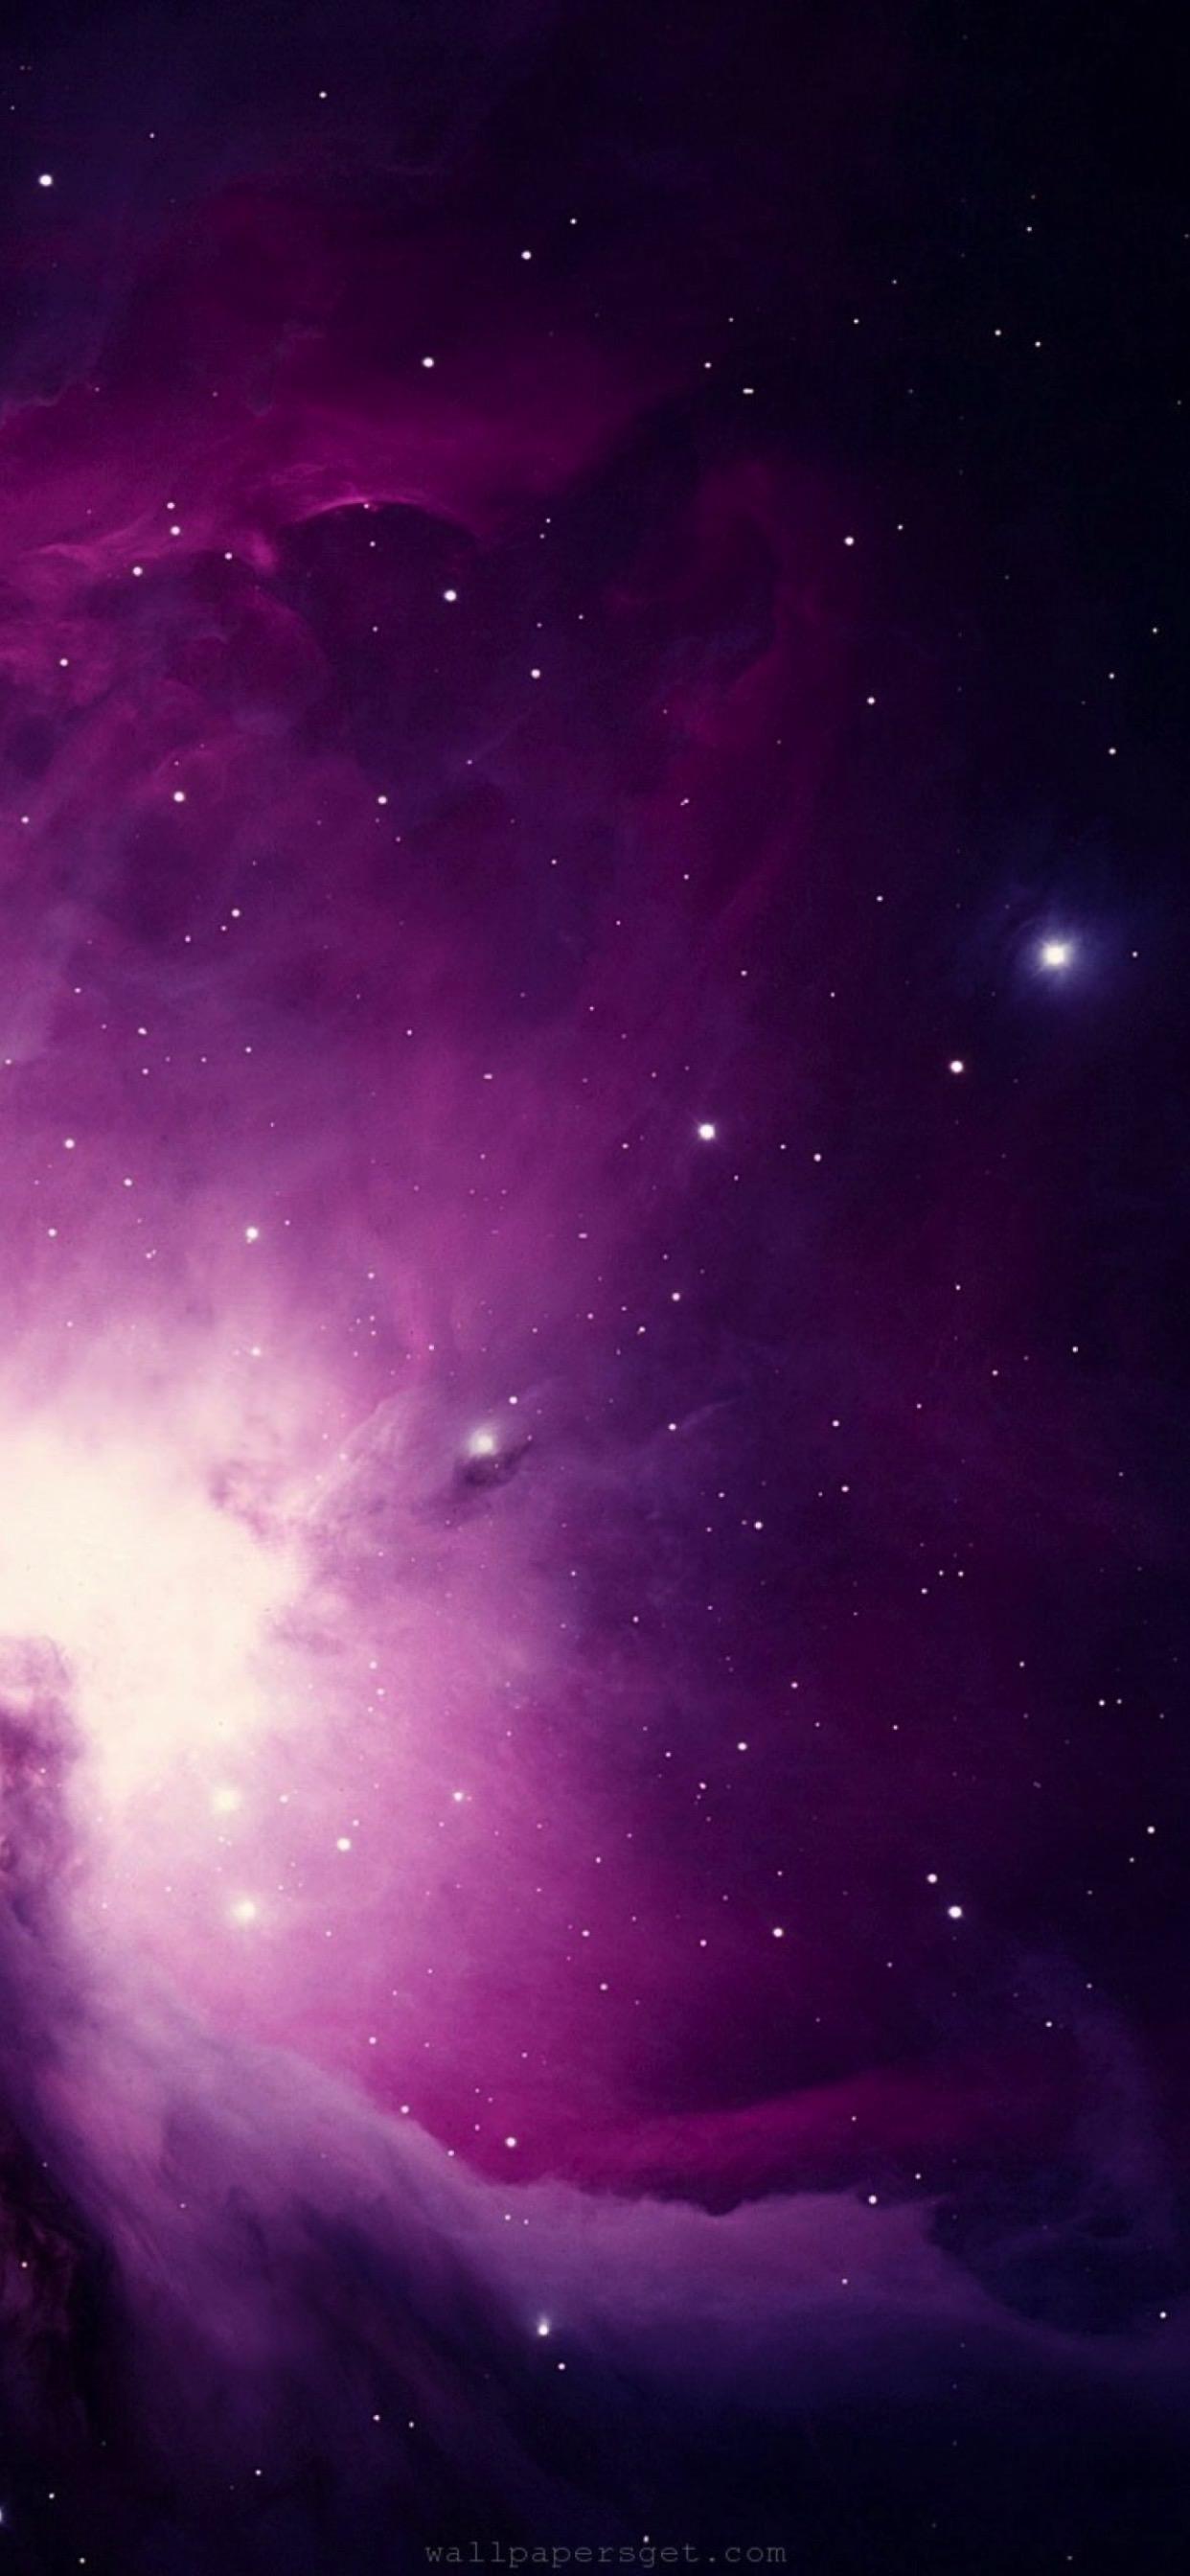 宇宙紫 Wallpaper Sc Iphone Xs Max壁紙